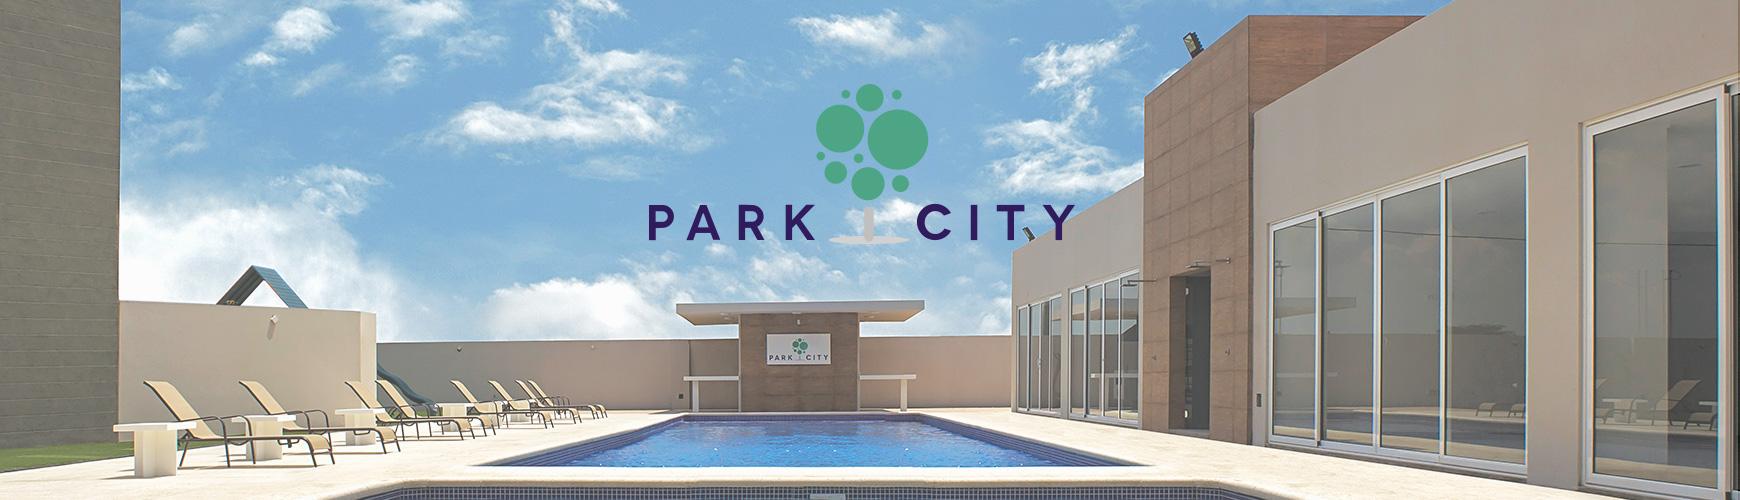 Condominio Park City Foto 1